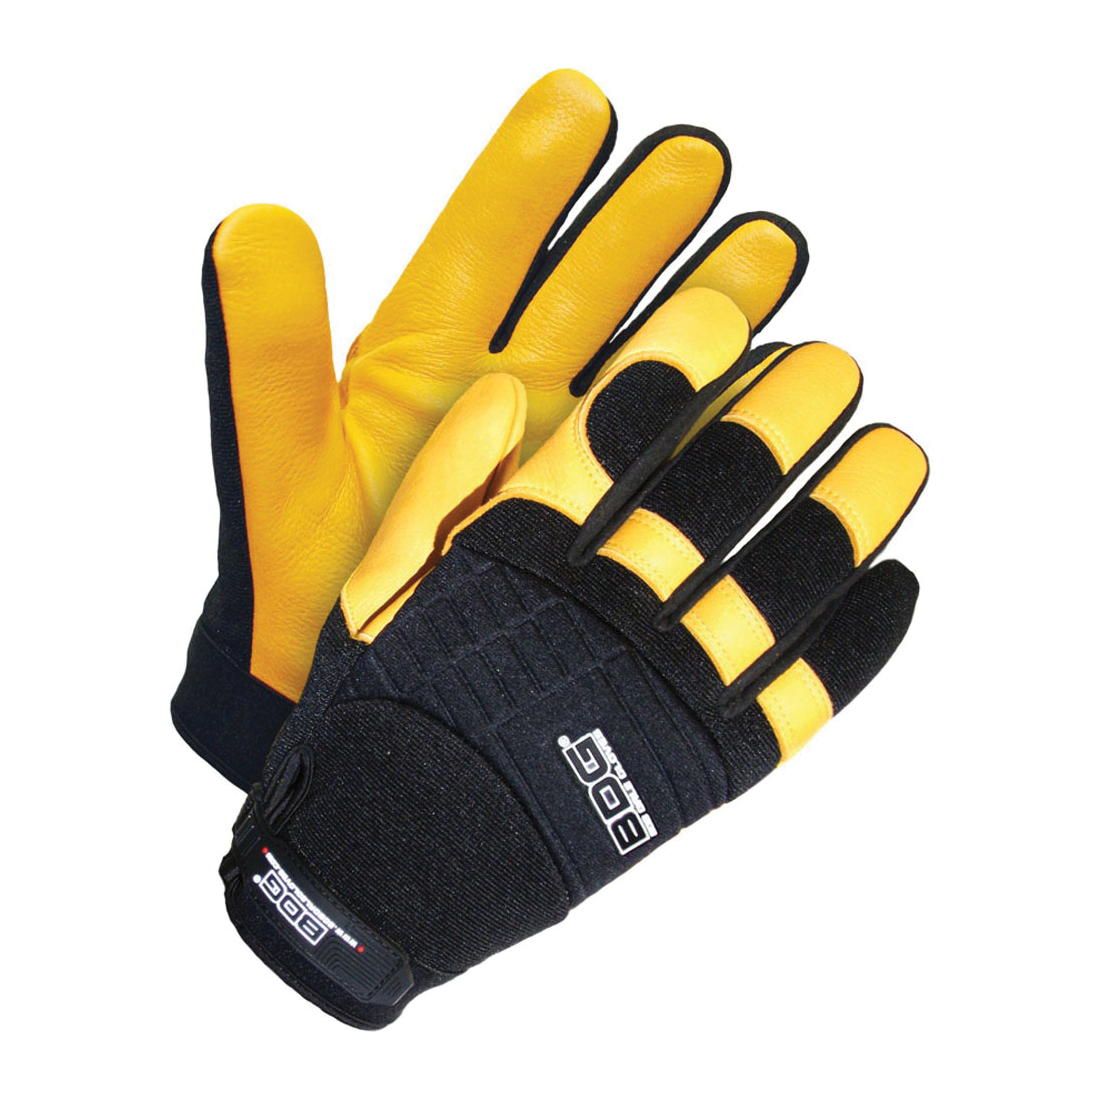 BDG X-SITE™ 20-1-10609-L Breathable Premium Grade General Purpose Gloves, Mechanics, Padded Knuckle/Wing Thumb Style, L/SZ 11, Grain Deerskin Leather Palm, Grain Deerskin Leather/Neoprene/Spandex®, Black/Gold, Elastic Wrist Cuff, Resists: Abrasion